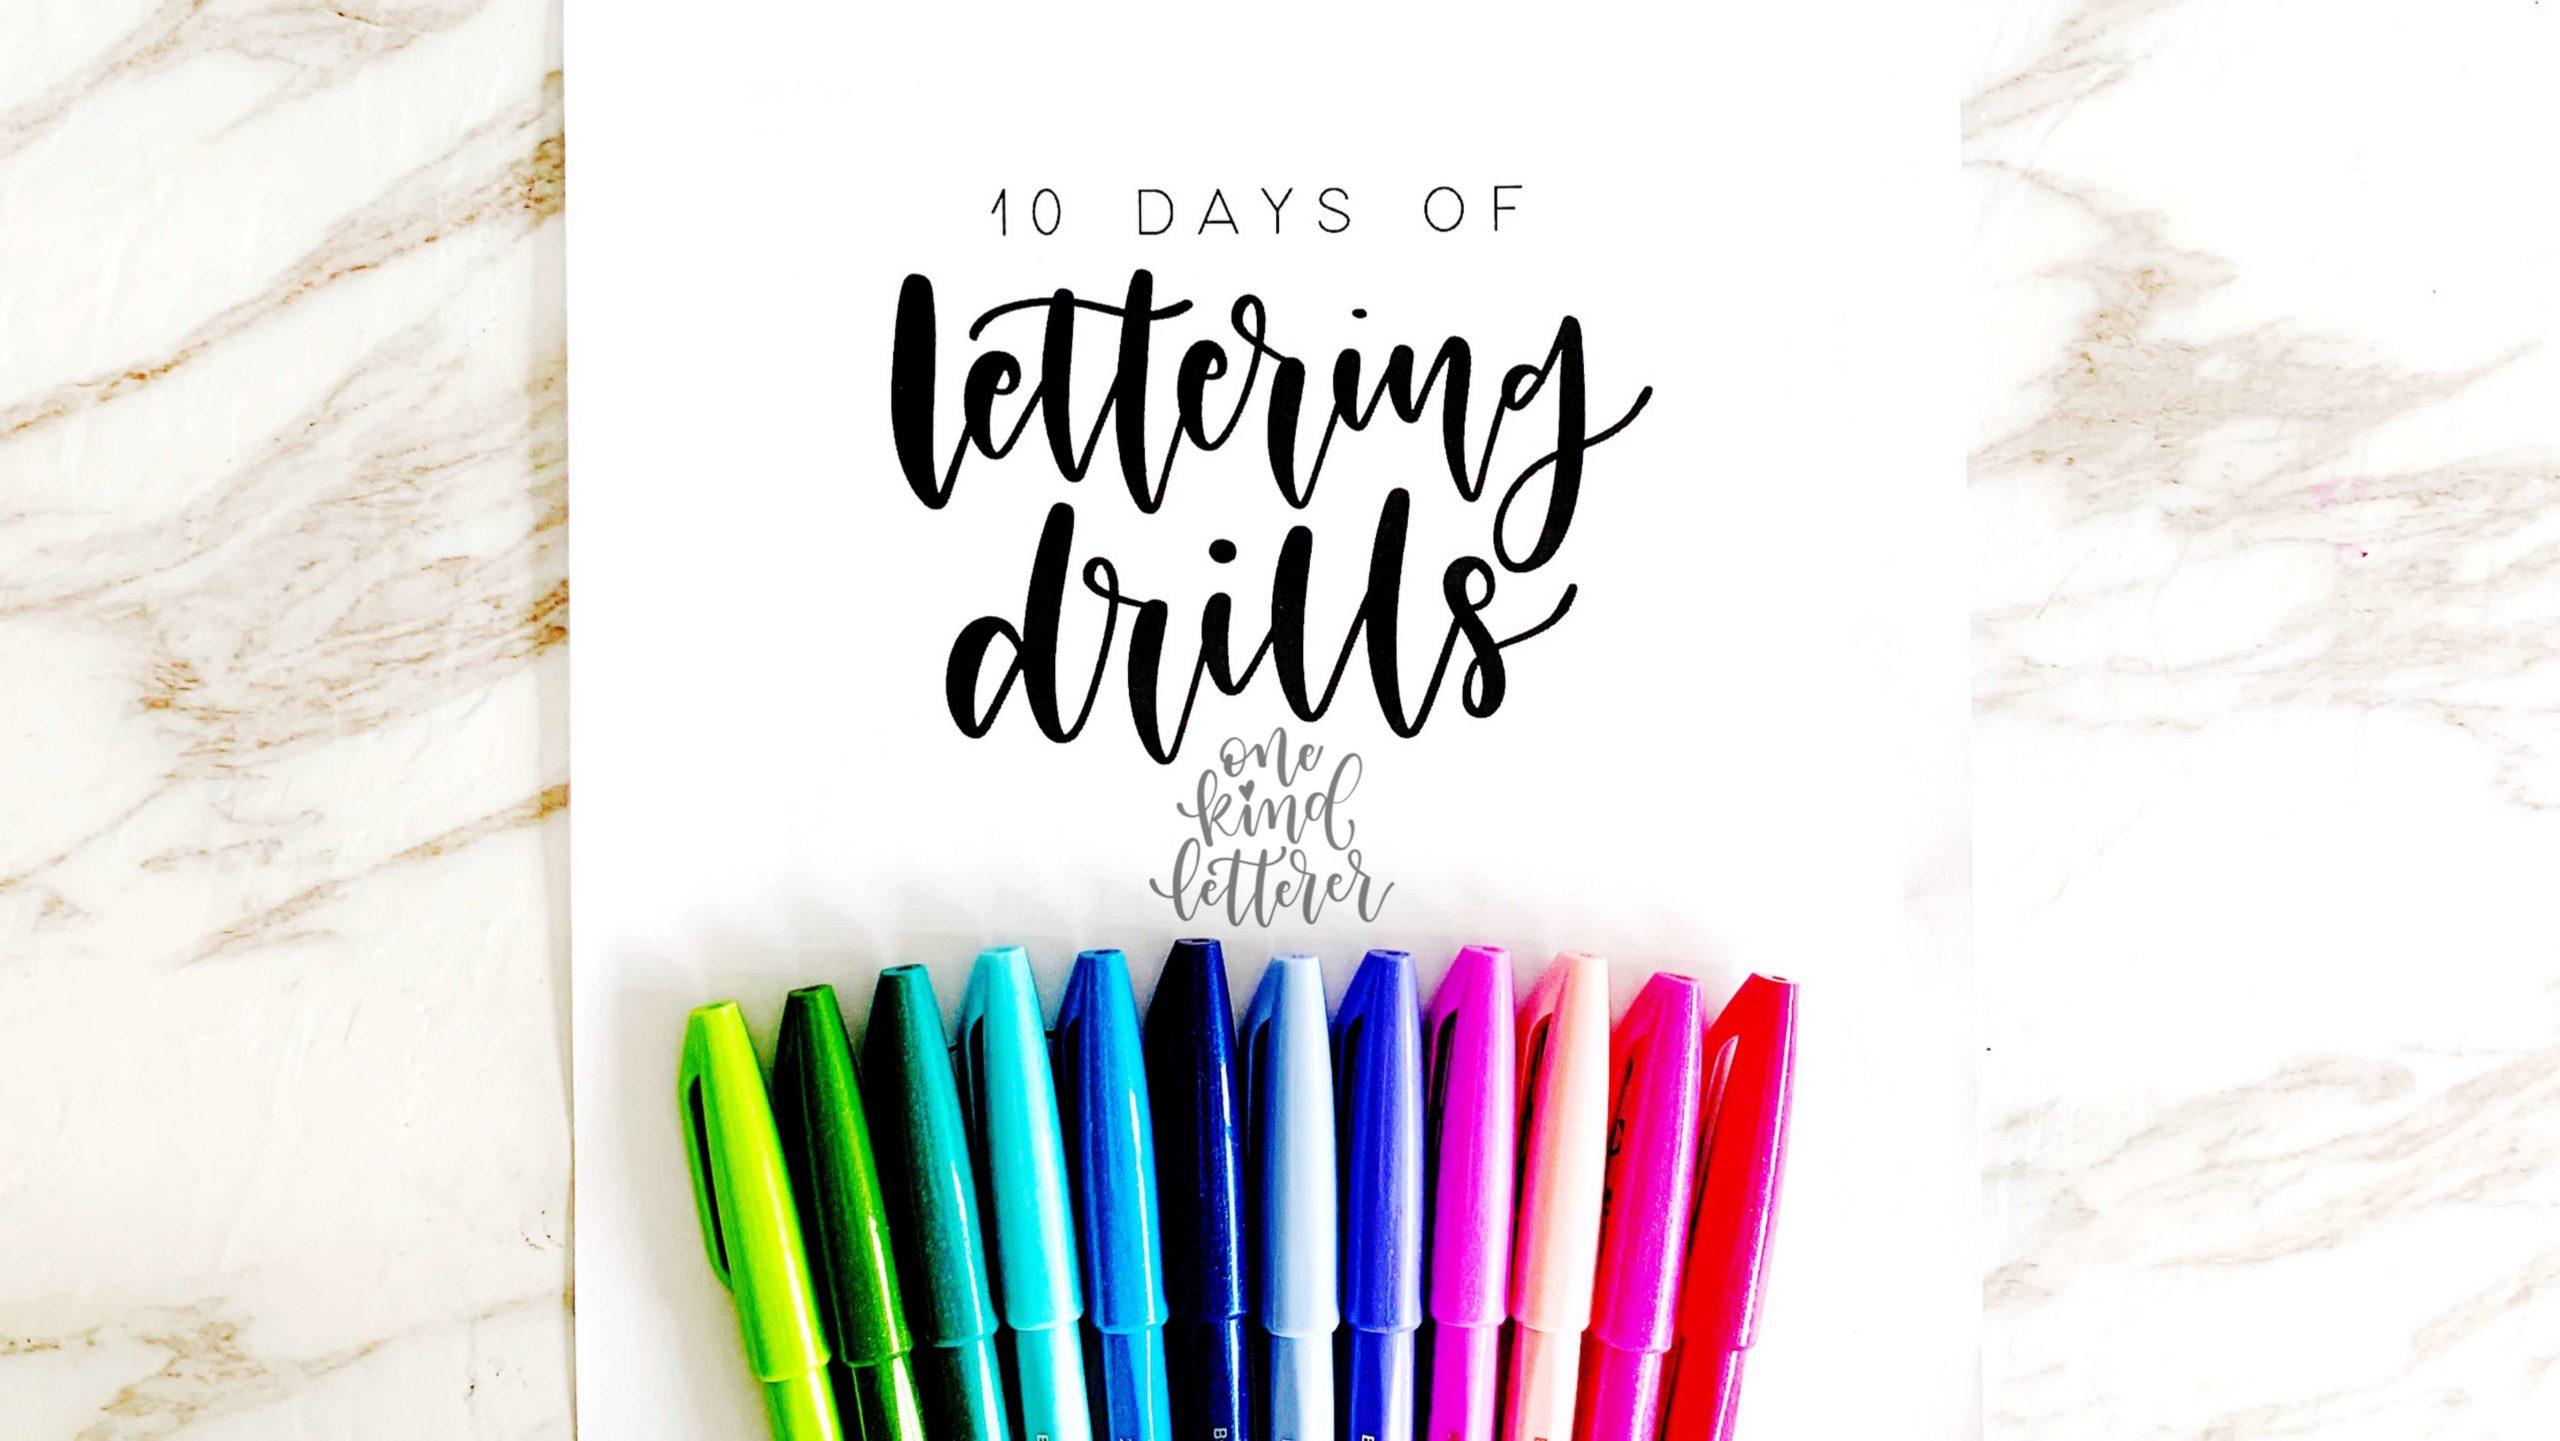 10 days of lettering drills worksheet_pentel pens variety_one kind letterer logo